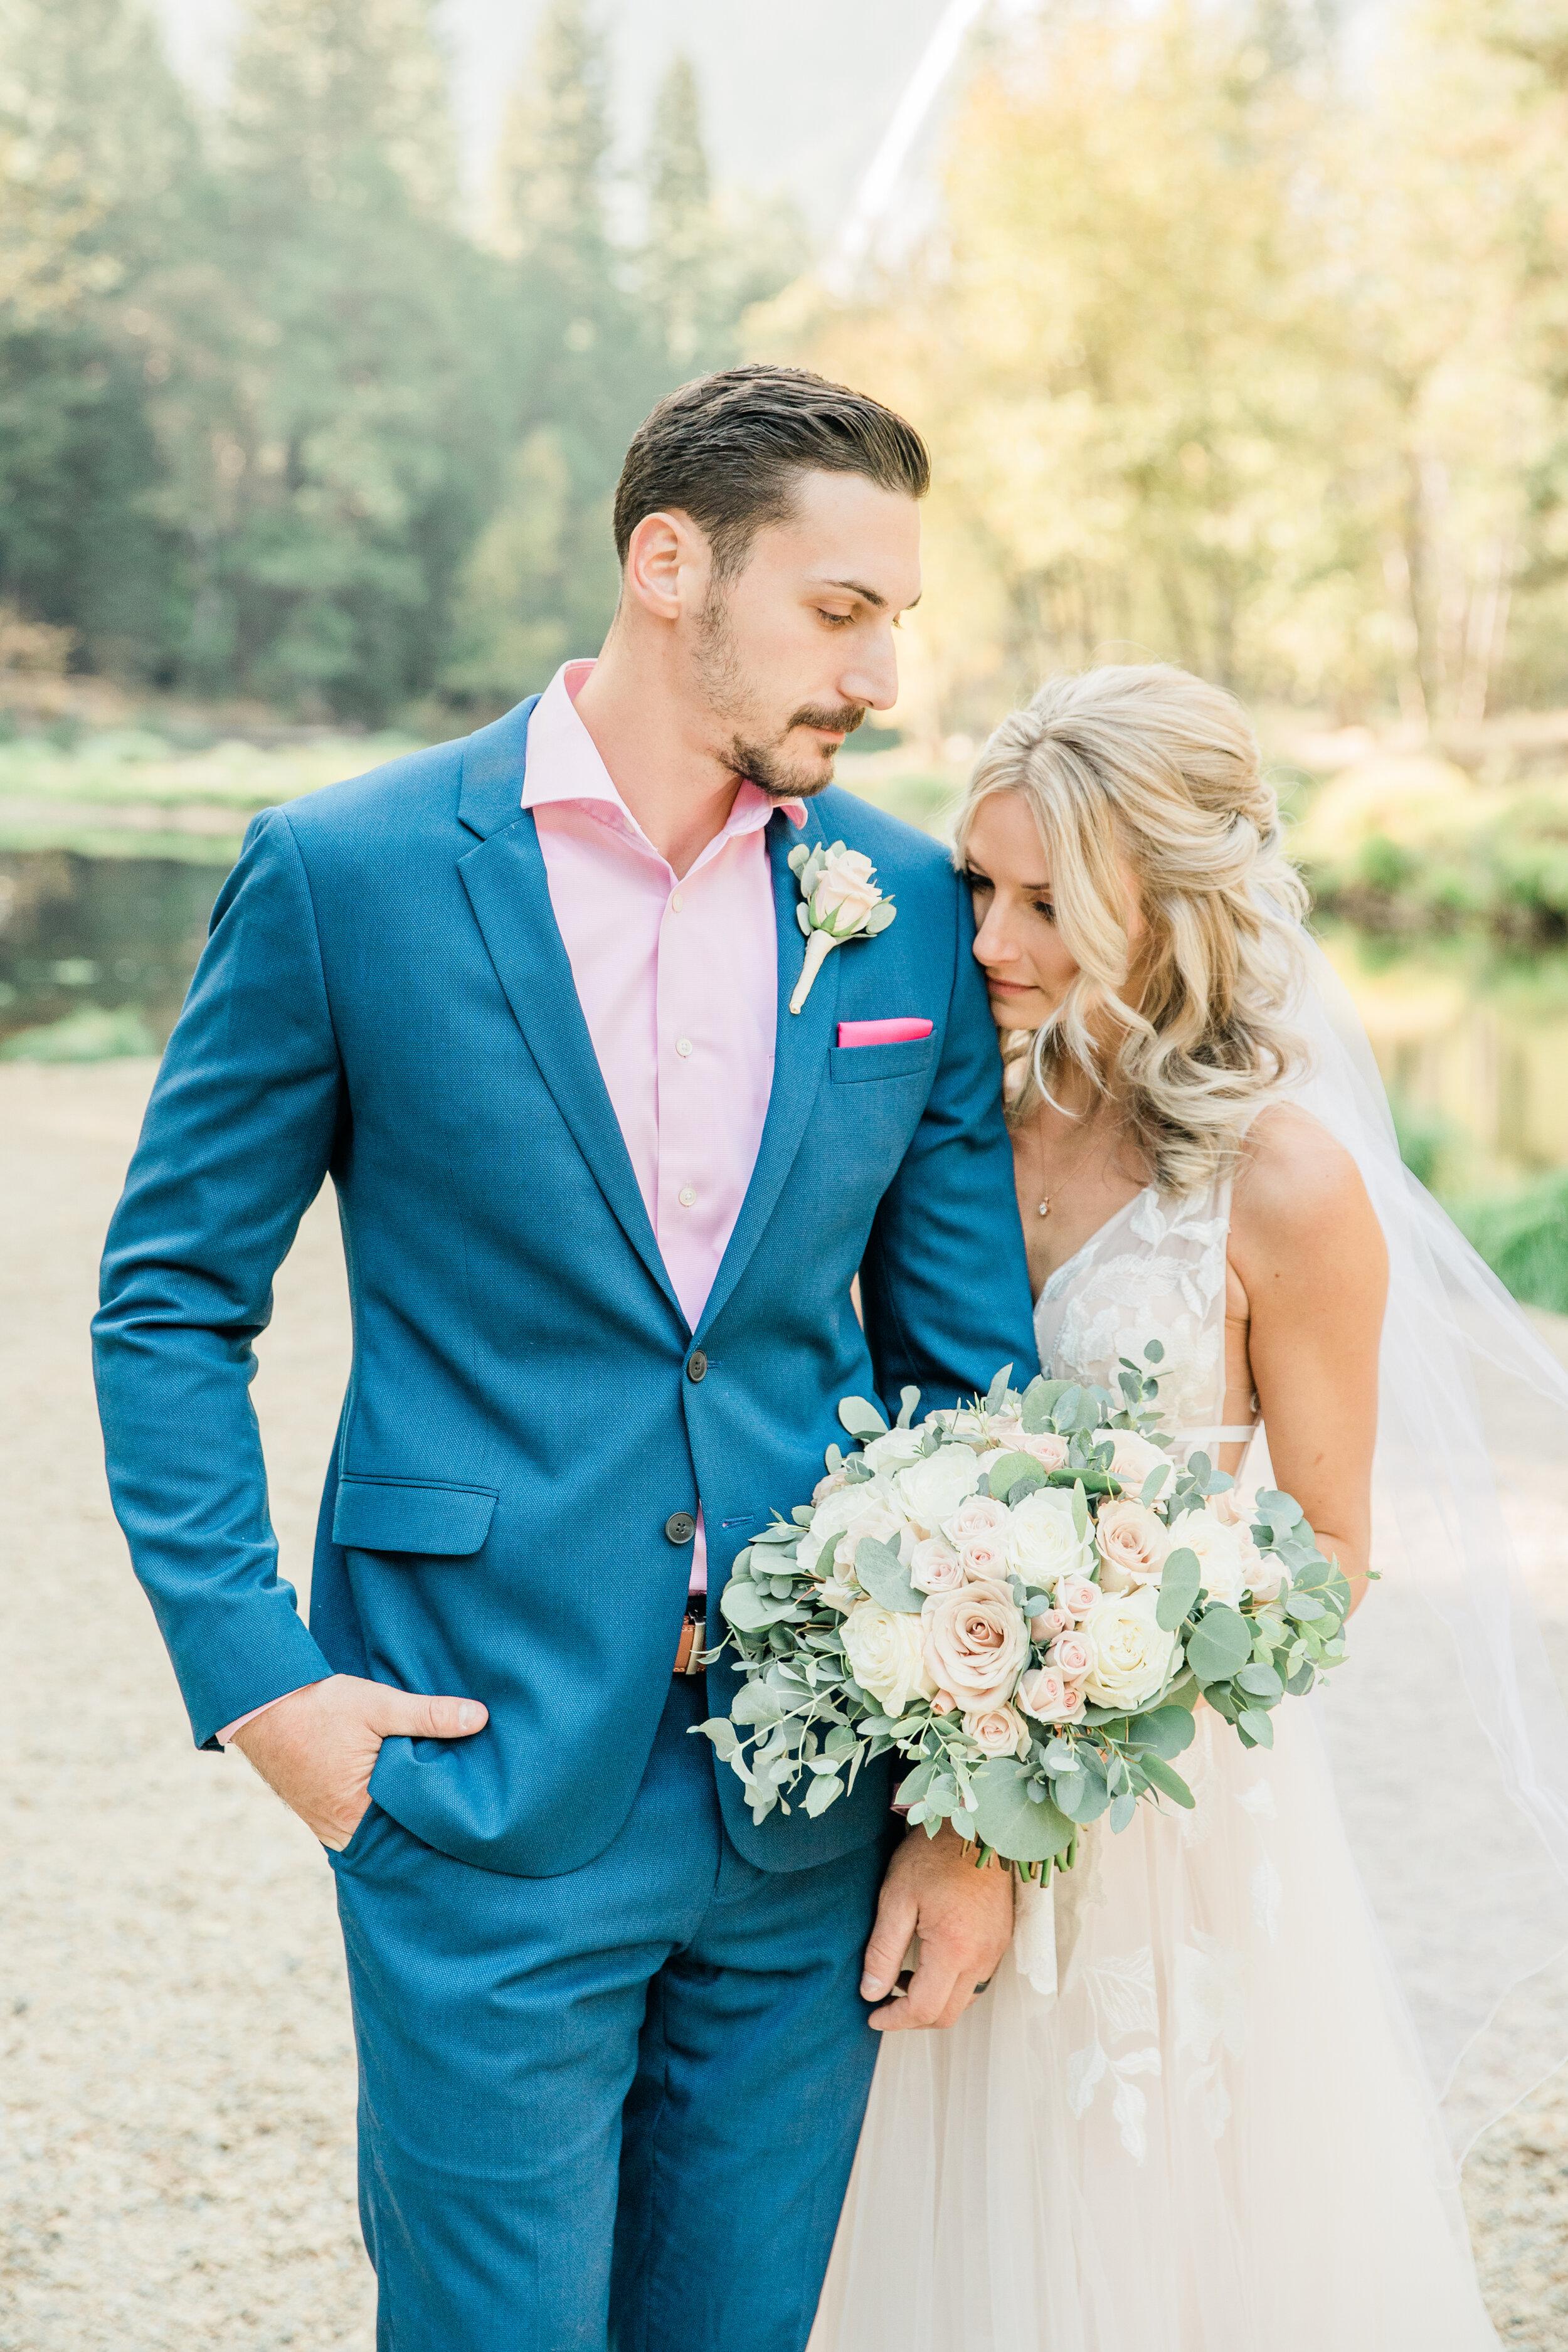 Leanne and Joe - Married - Sneak Peeks - Lauren Alisse Photography-27.jpg